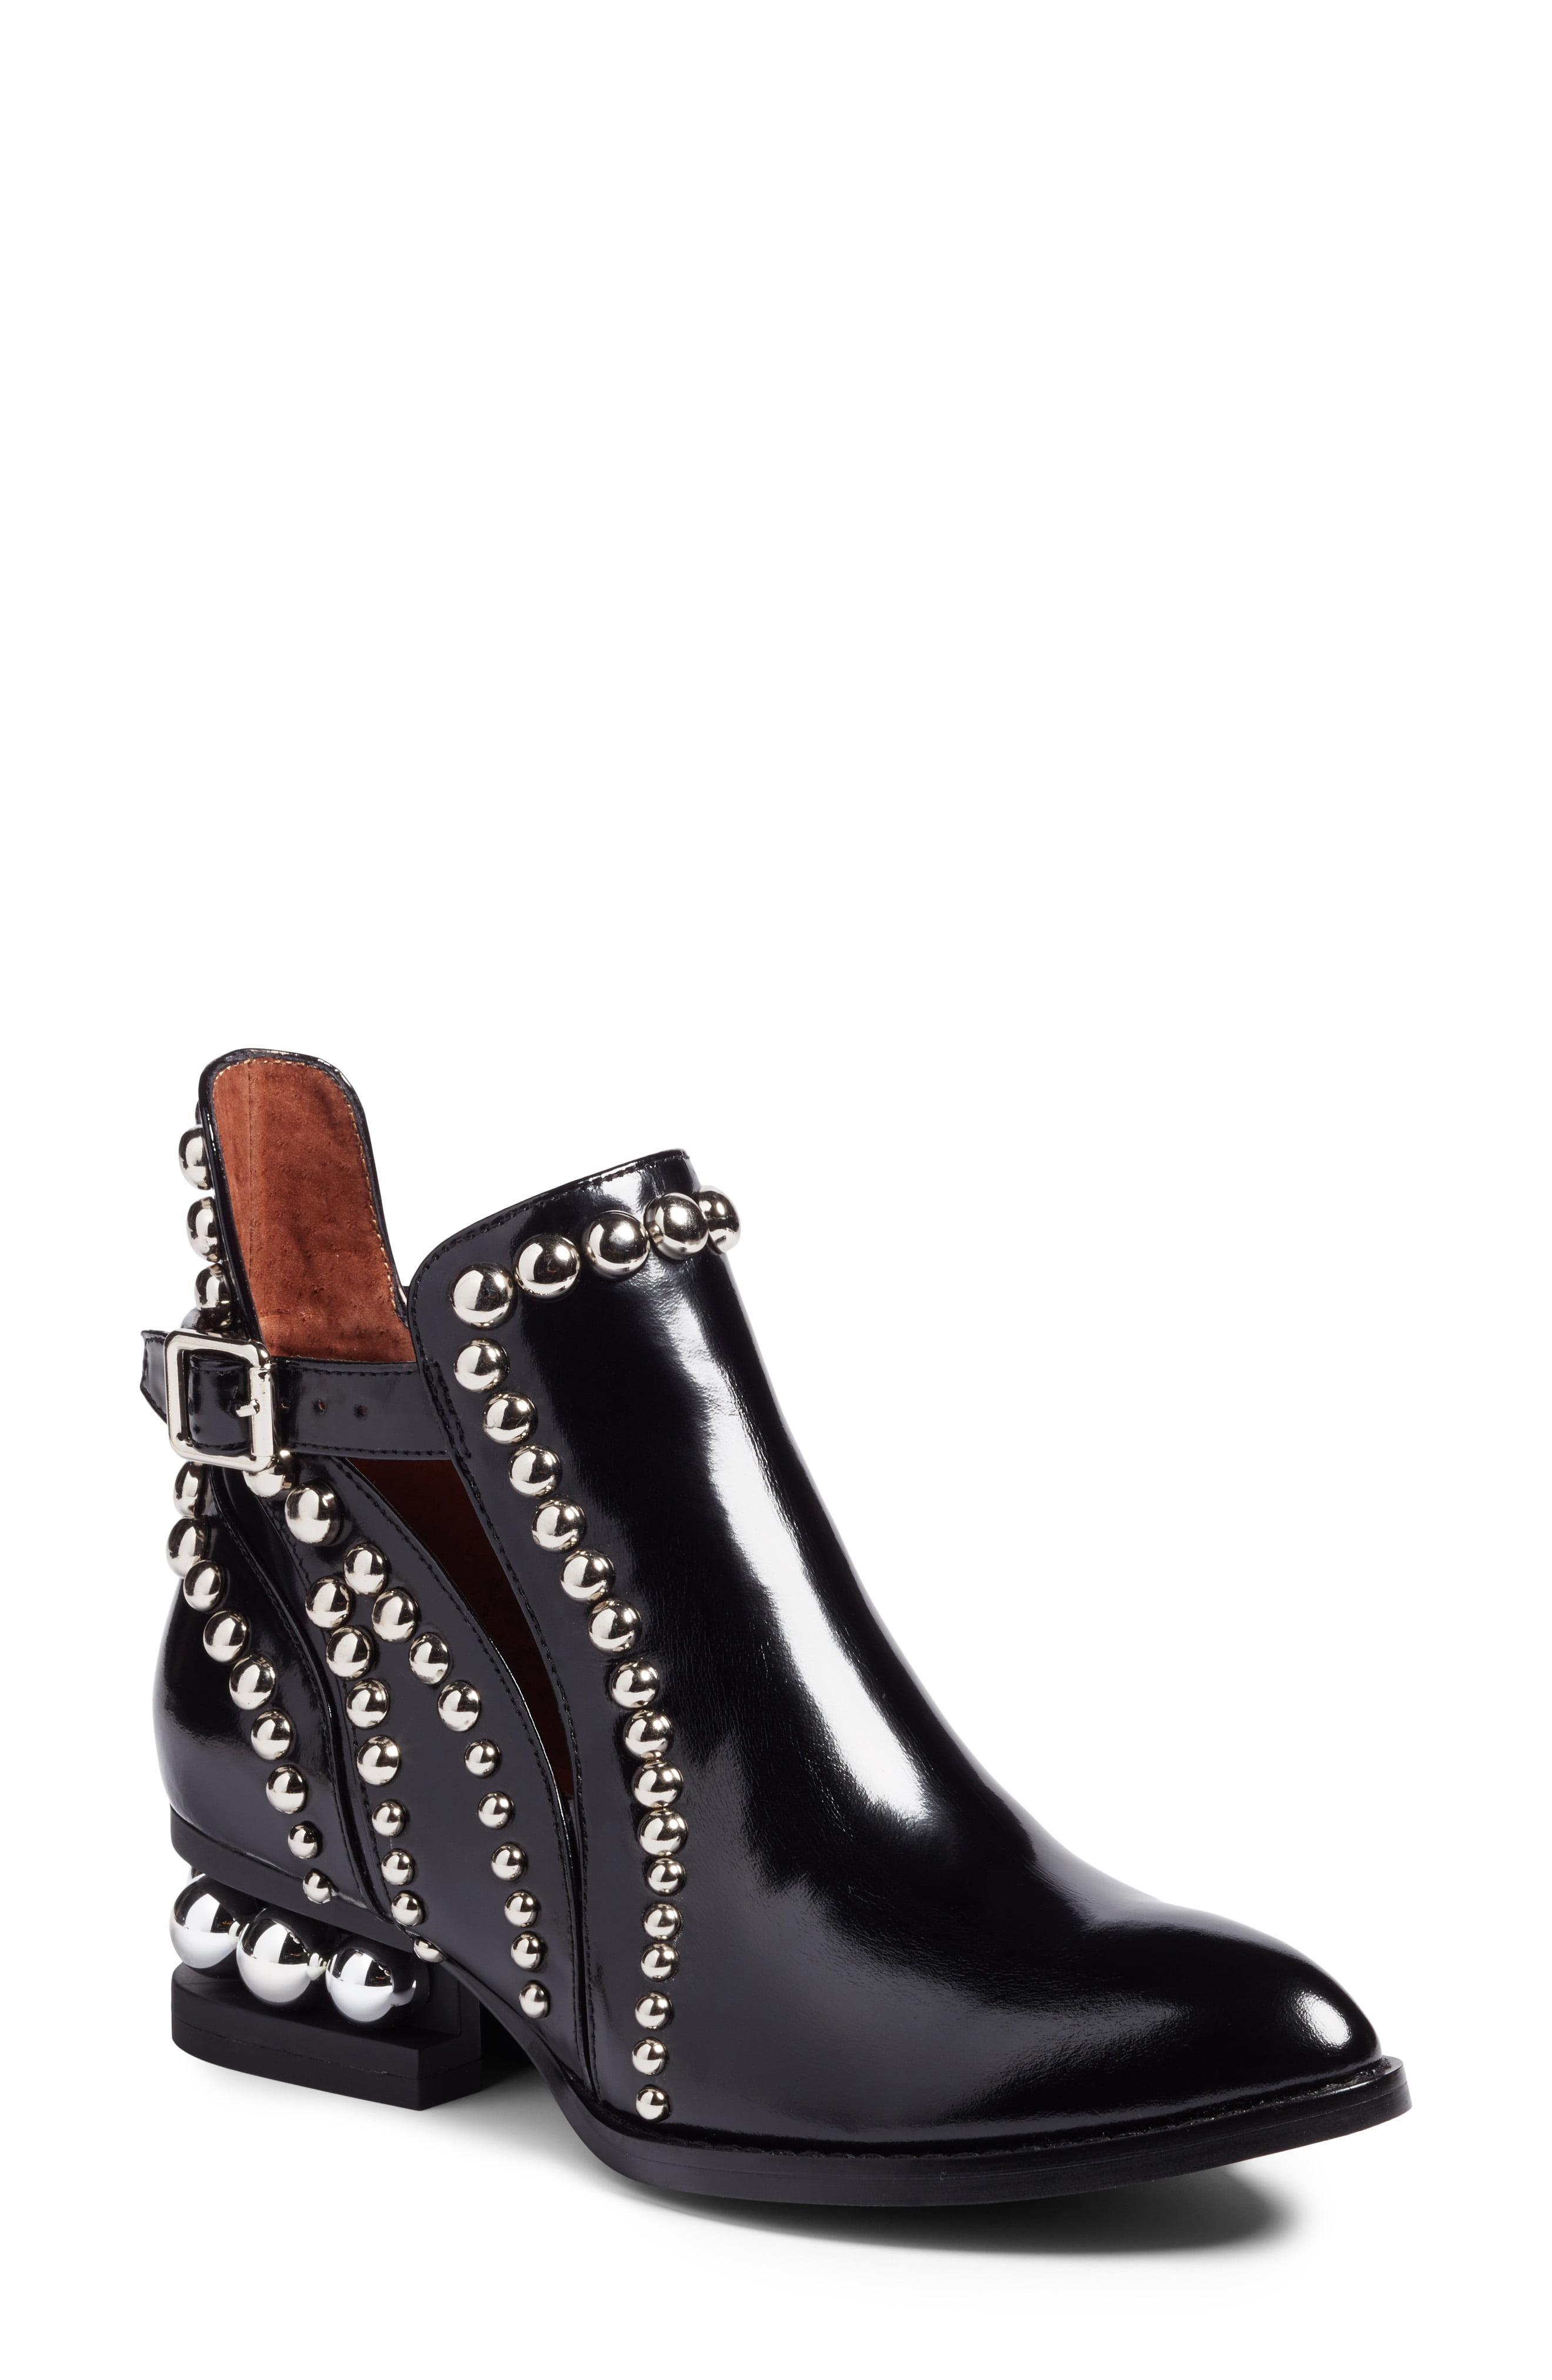 053556eda7d Jeffrey Campbell - Black Rylance Studded Boots - Lyst. View fullscreen